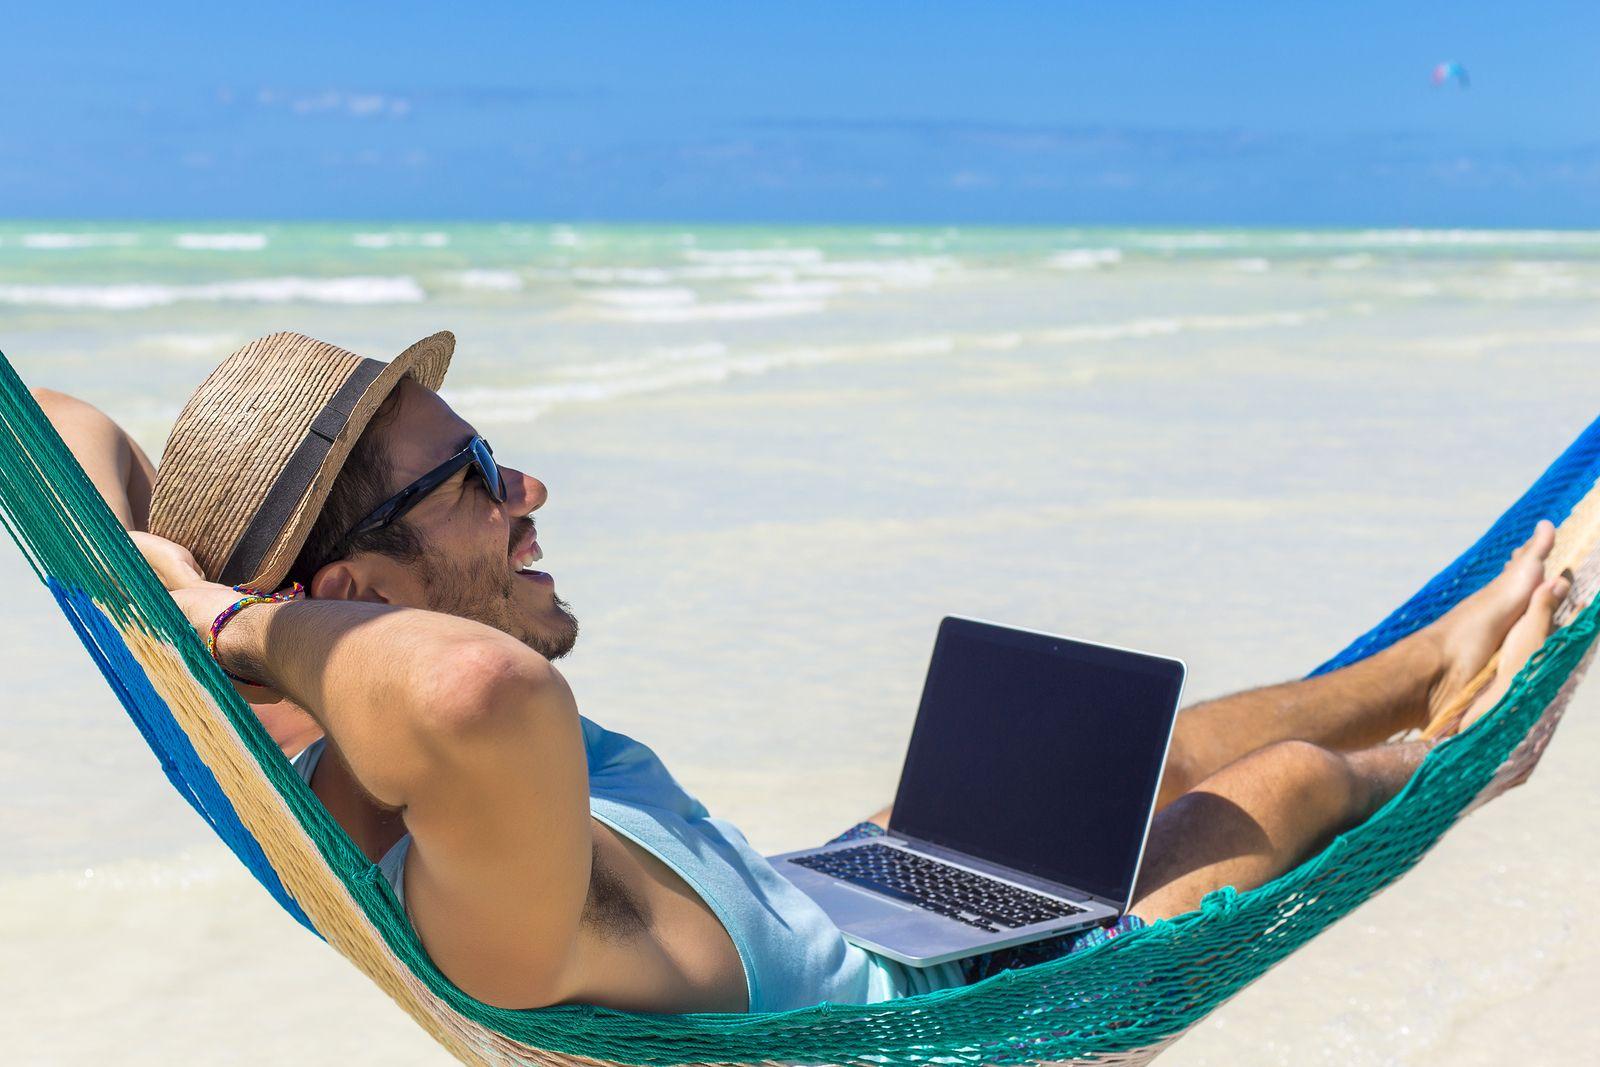 Entrepreneur-ing Yourself Into Retirement